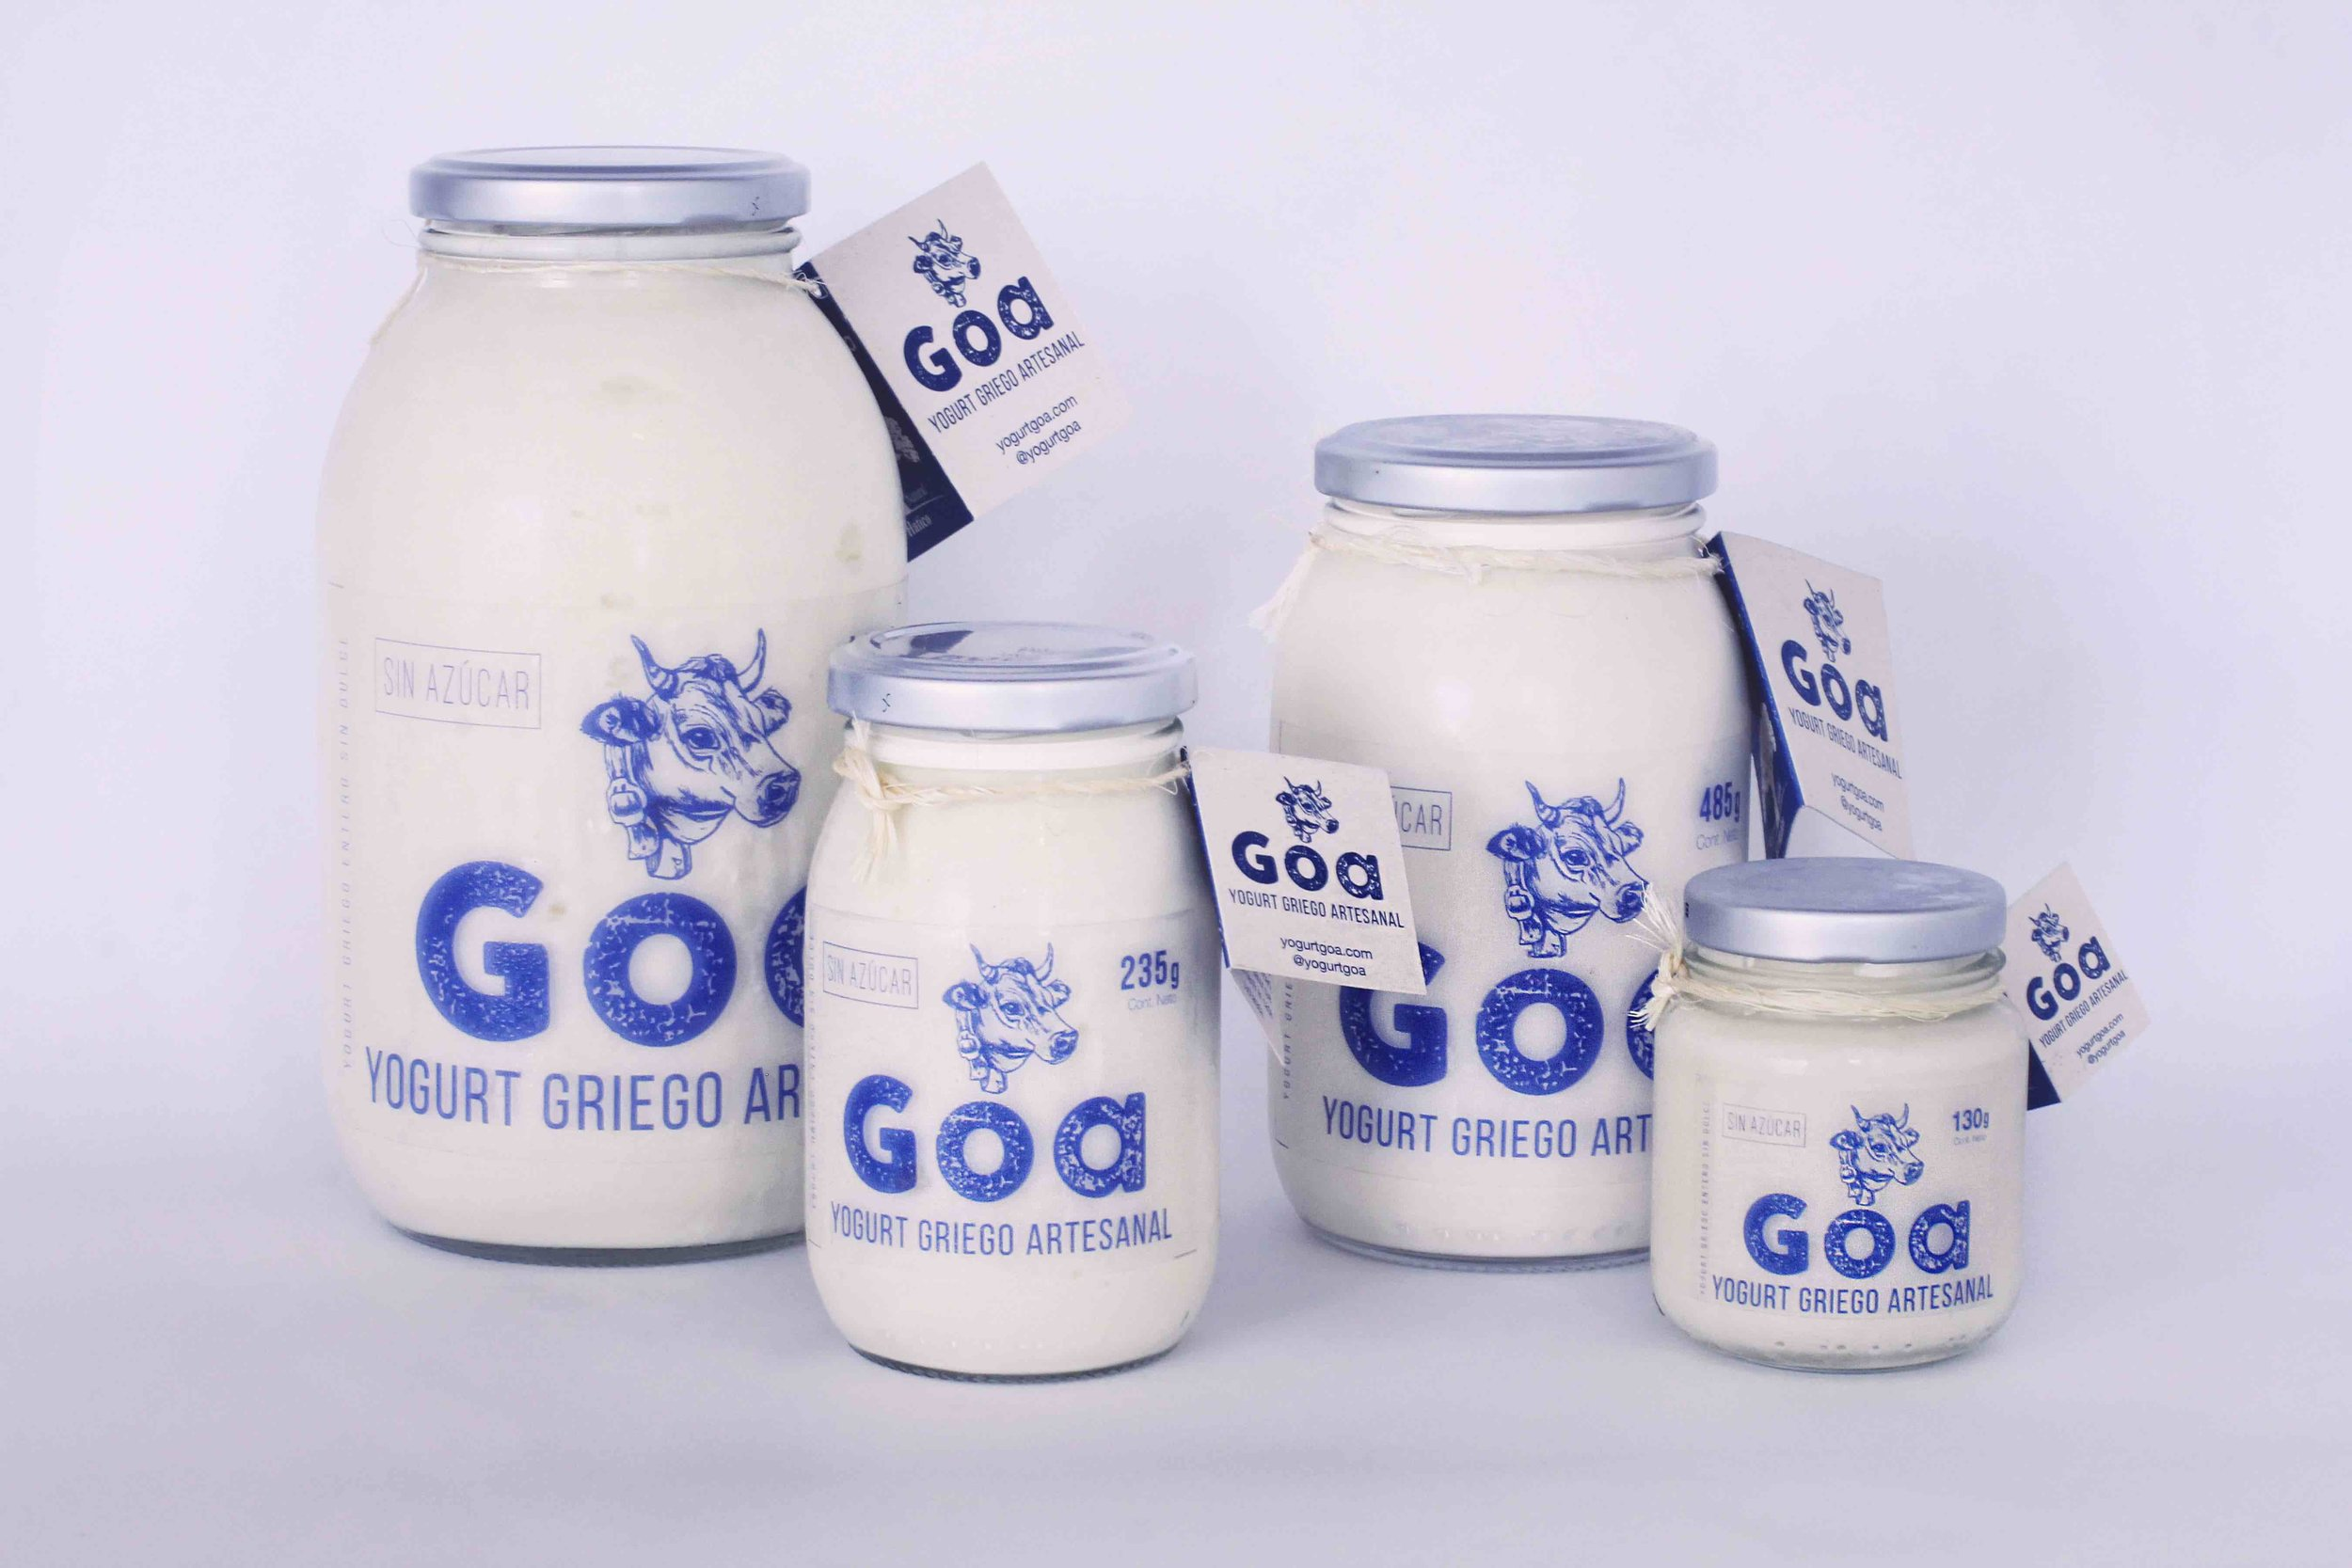 Multiproducto Goa copy.jpg